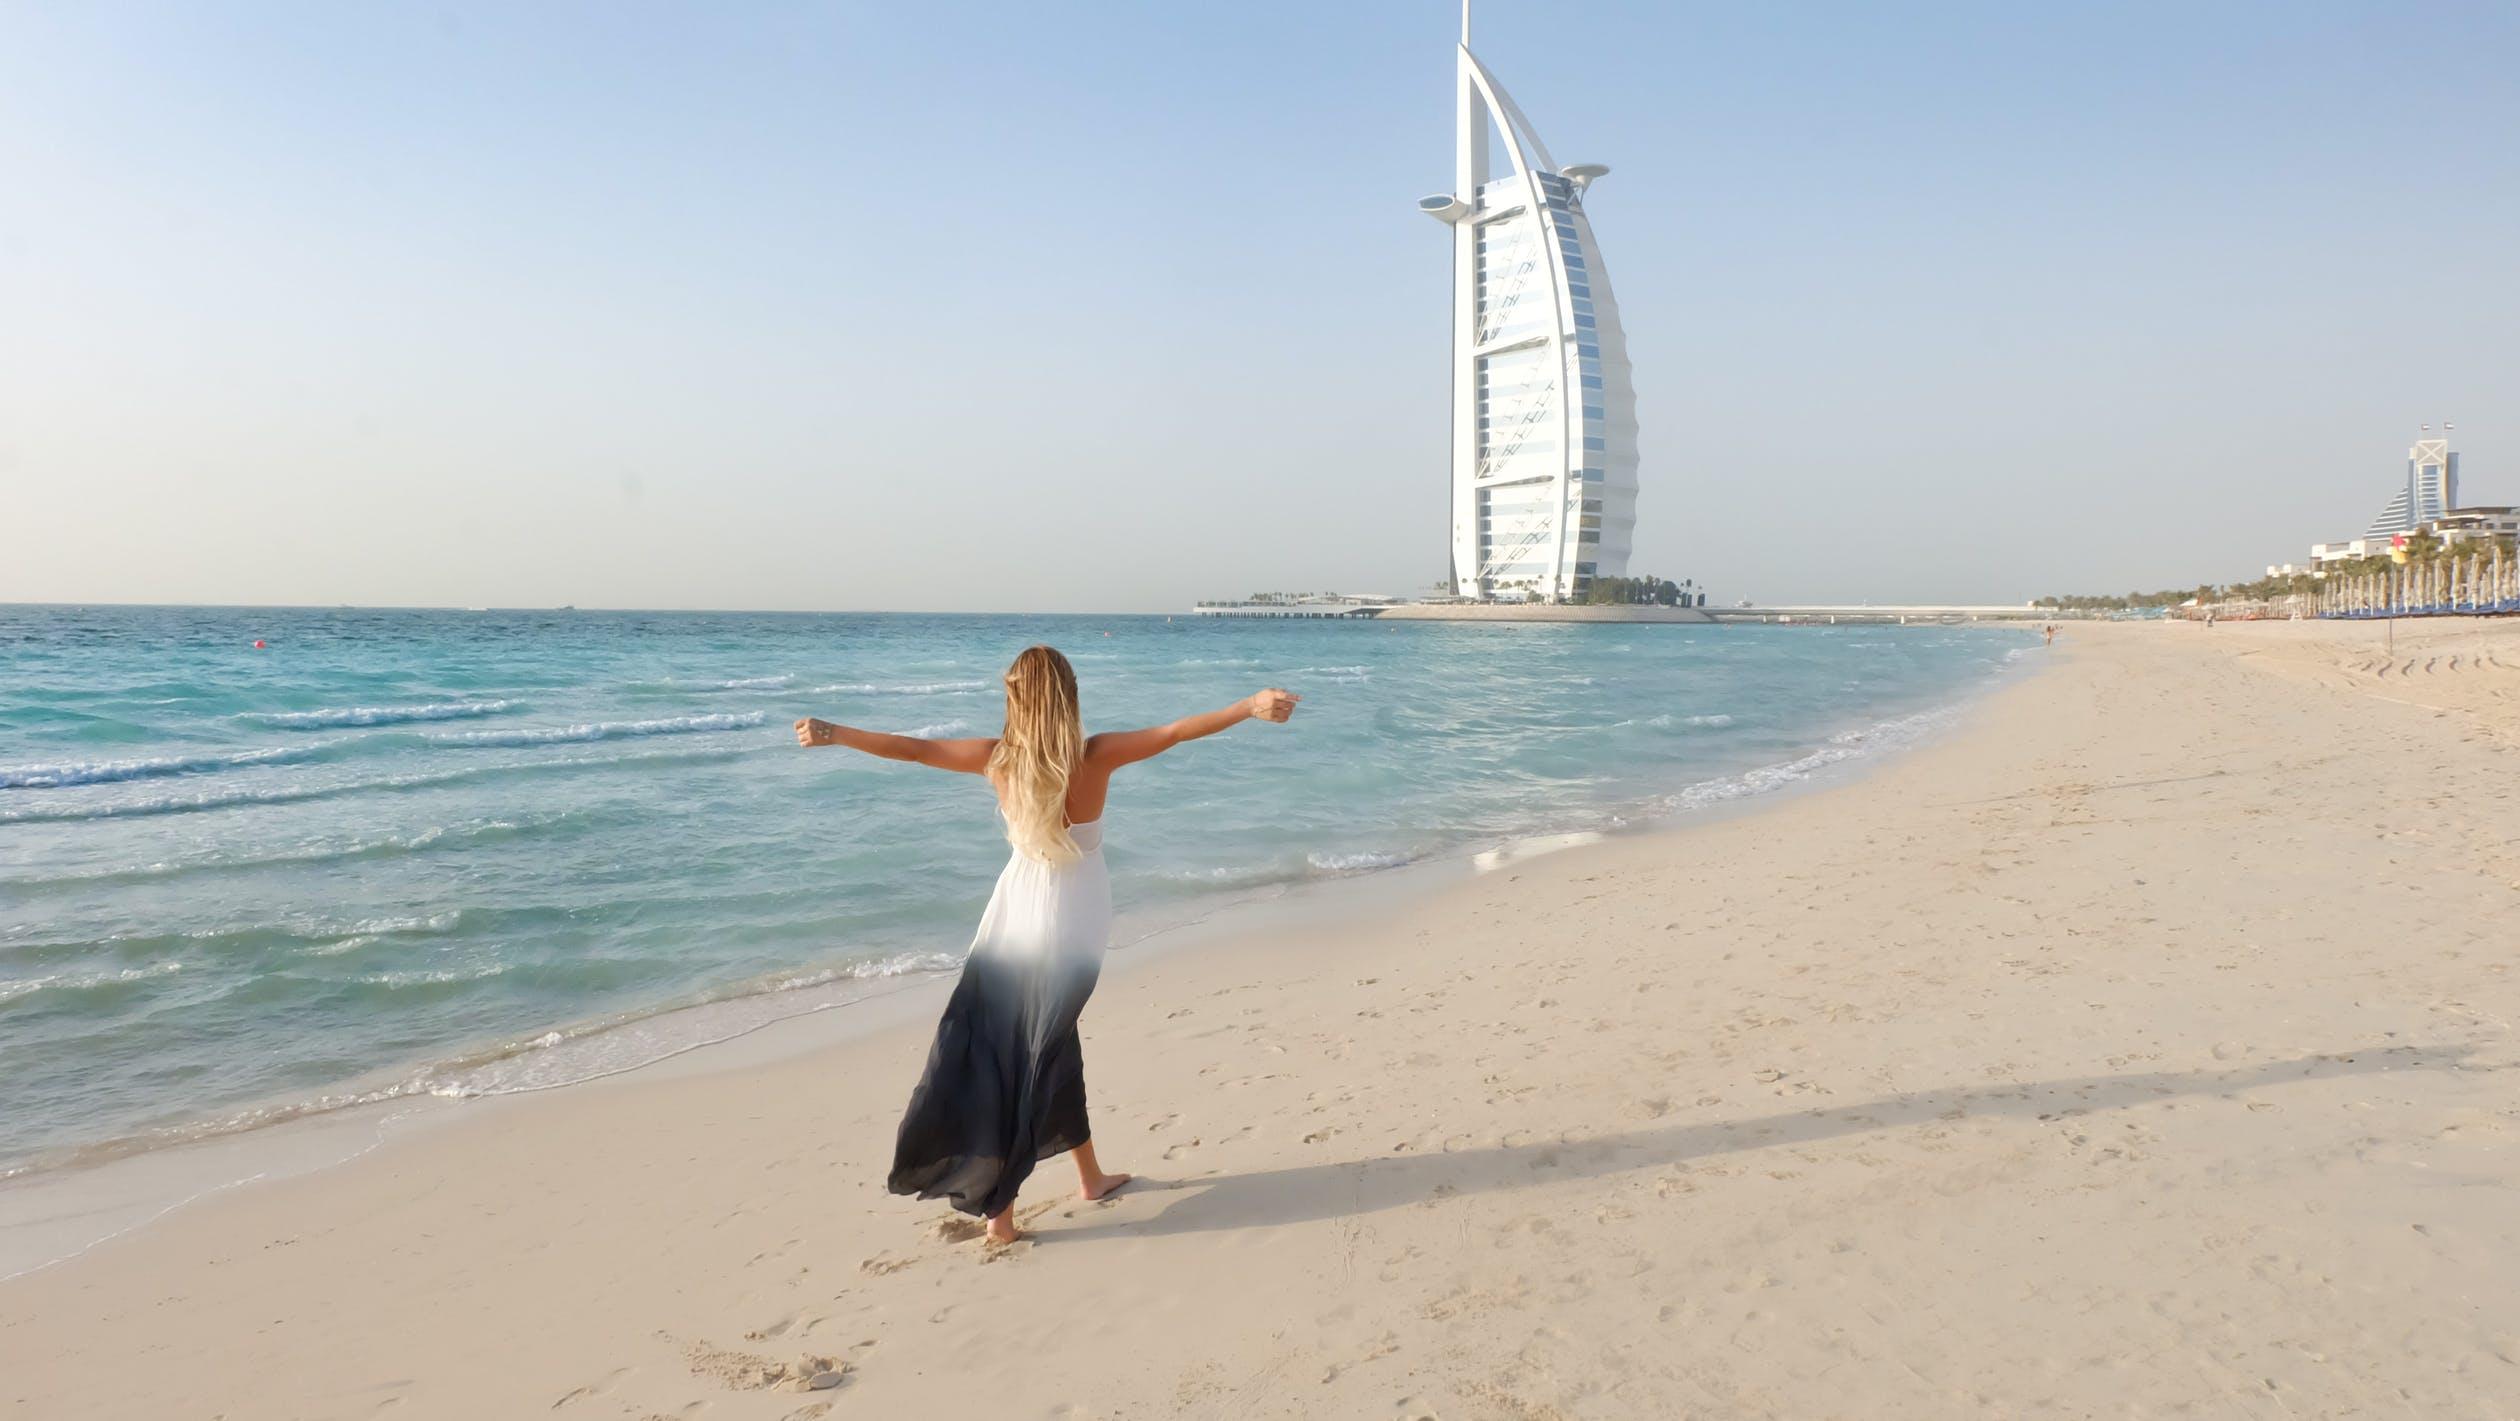 Living In Dubai – The Pros & Cons through my Experience